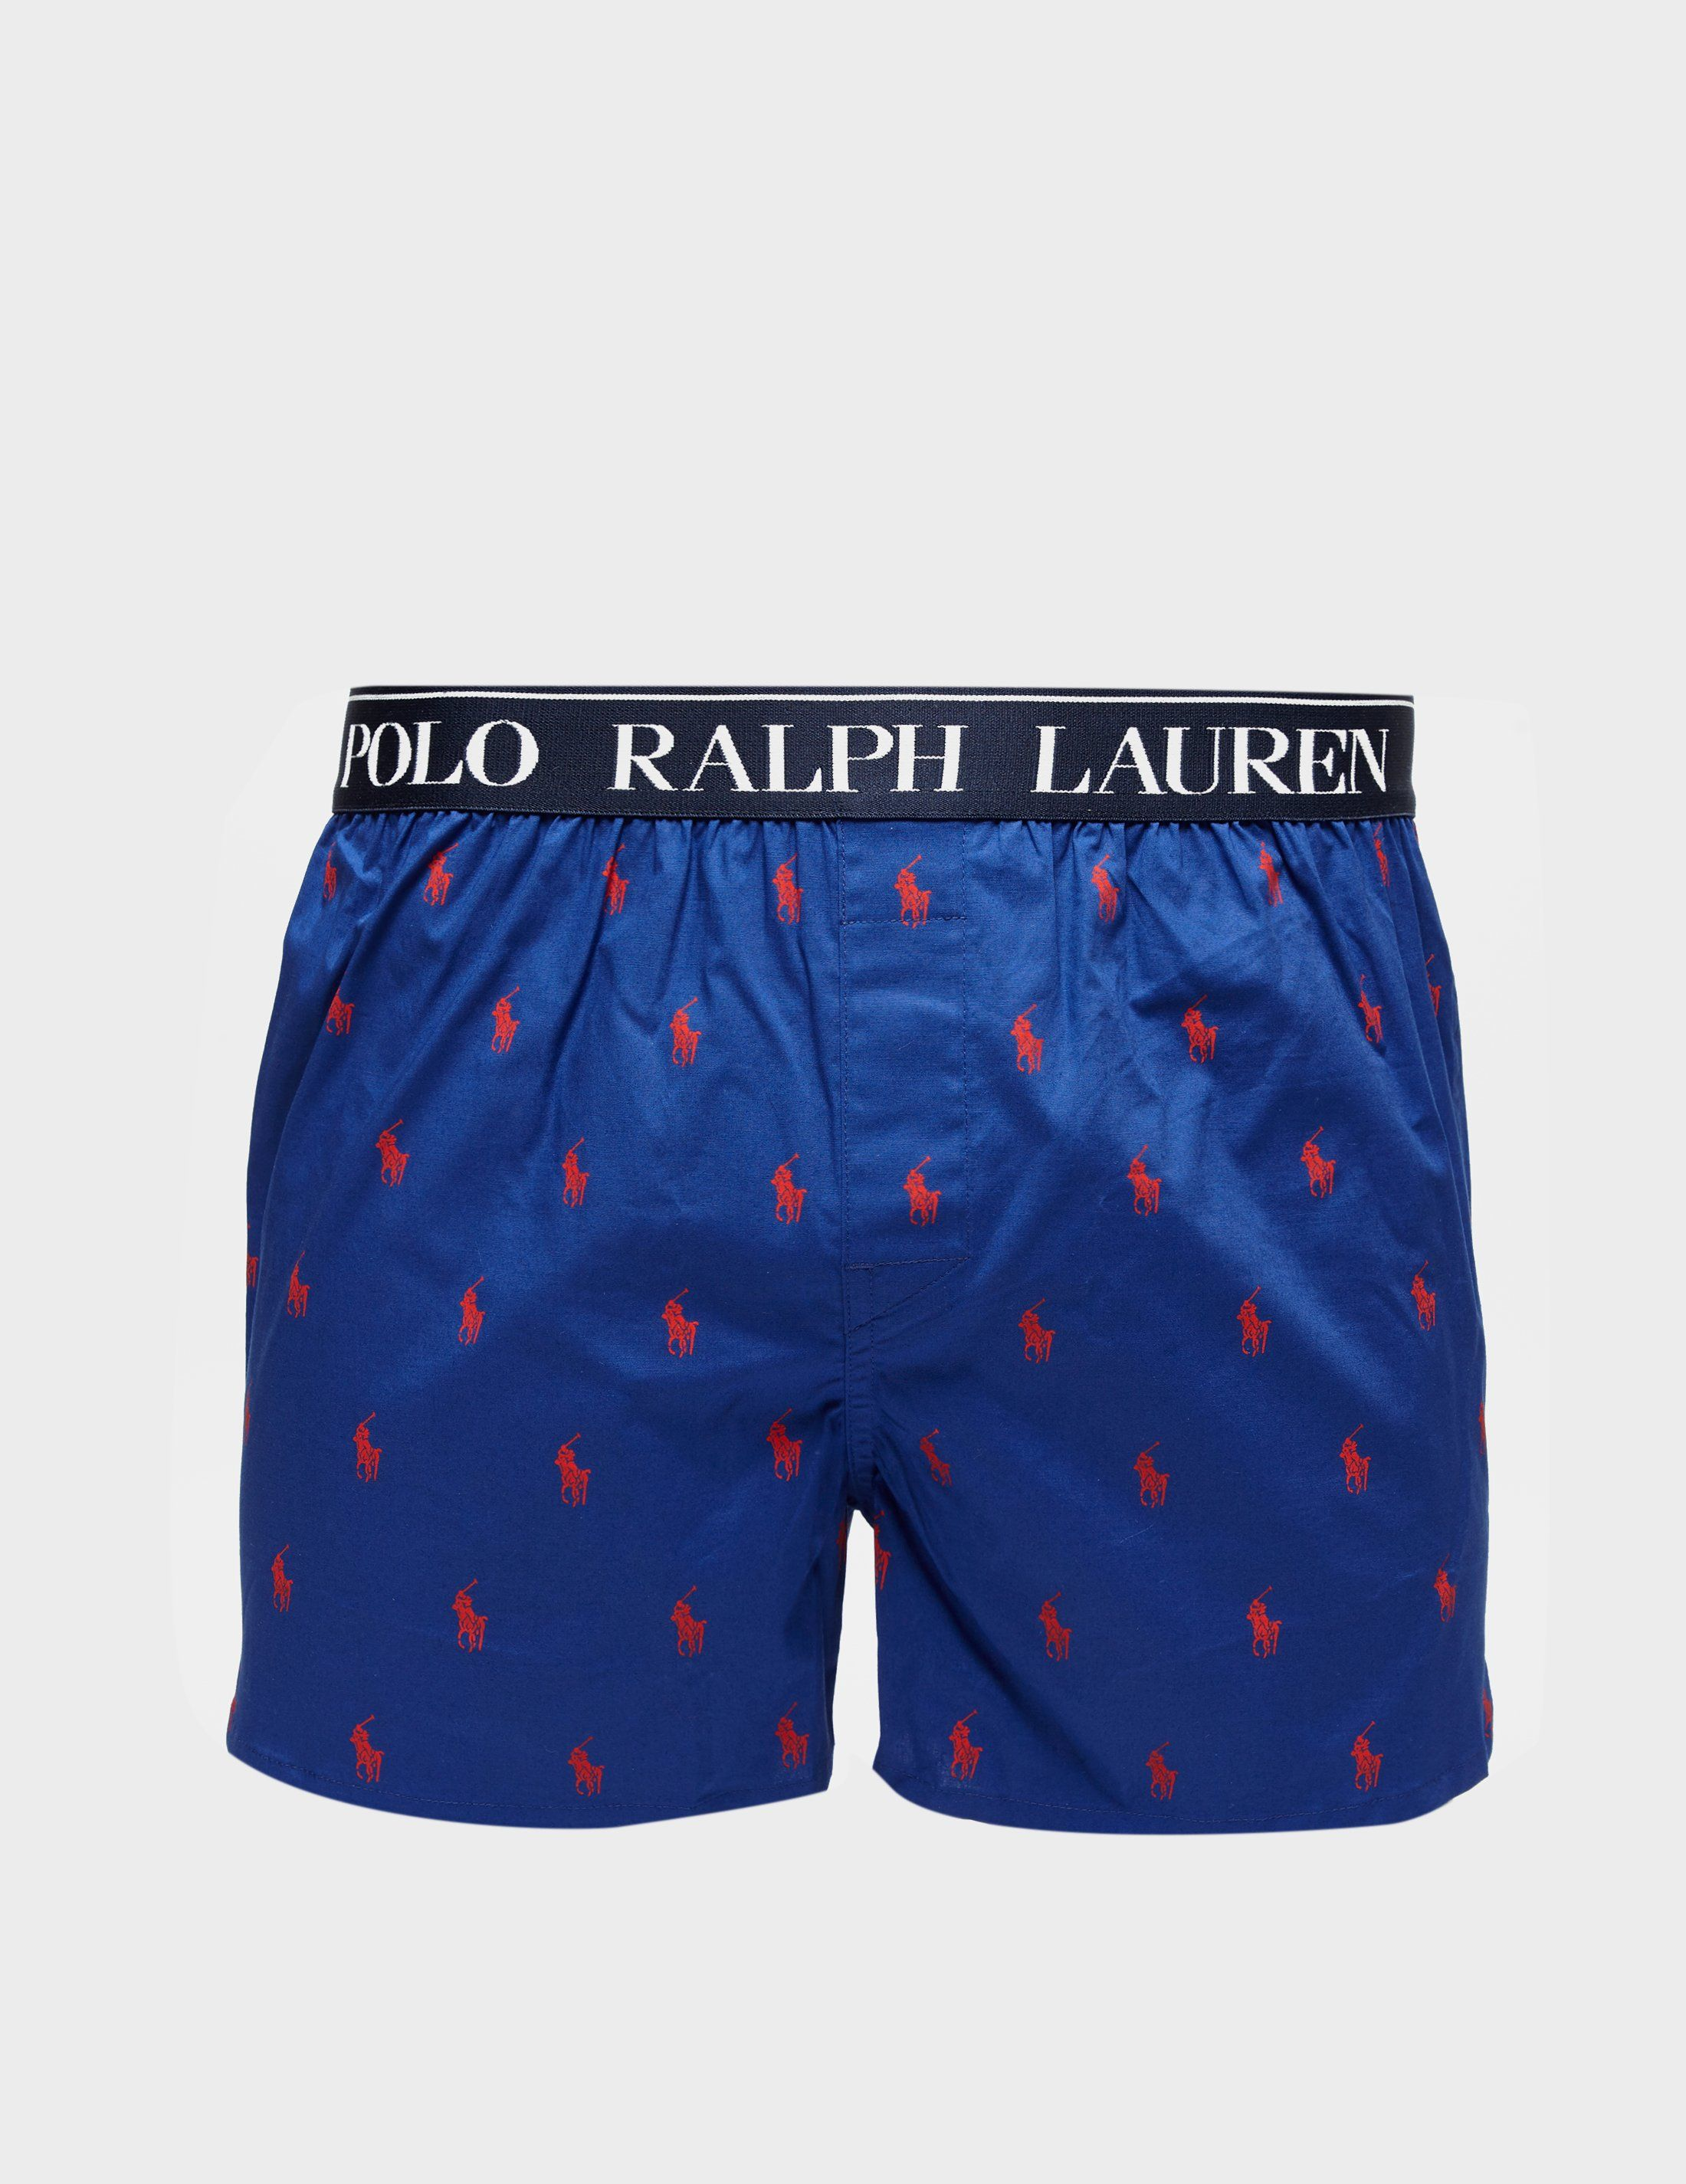 Polo Ralph Lauren All Over Print Woven Boxer Shorts